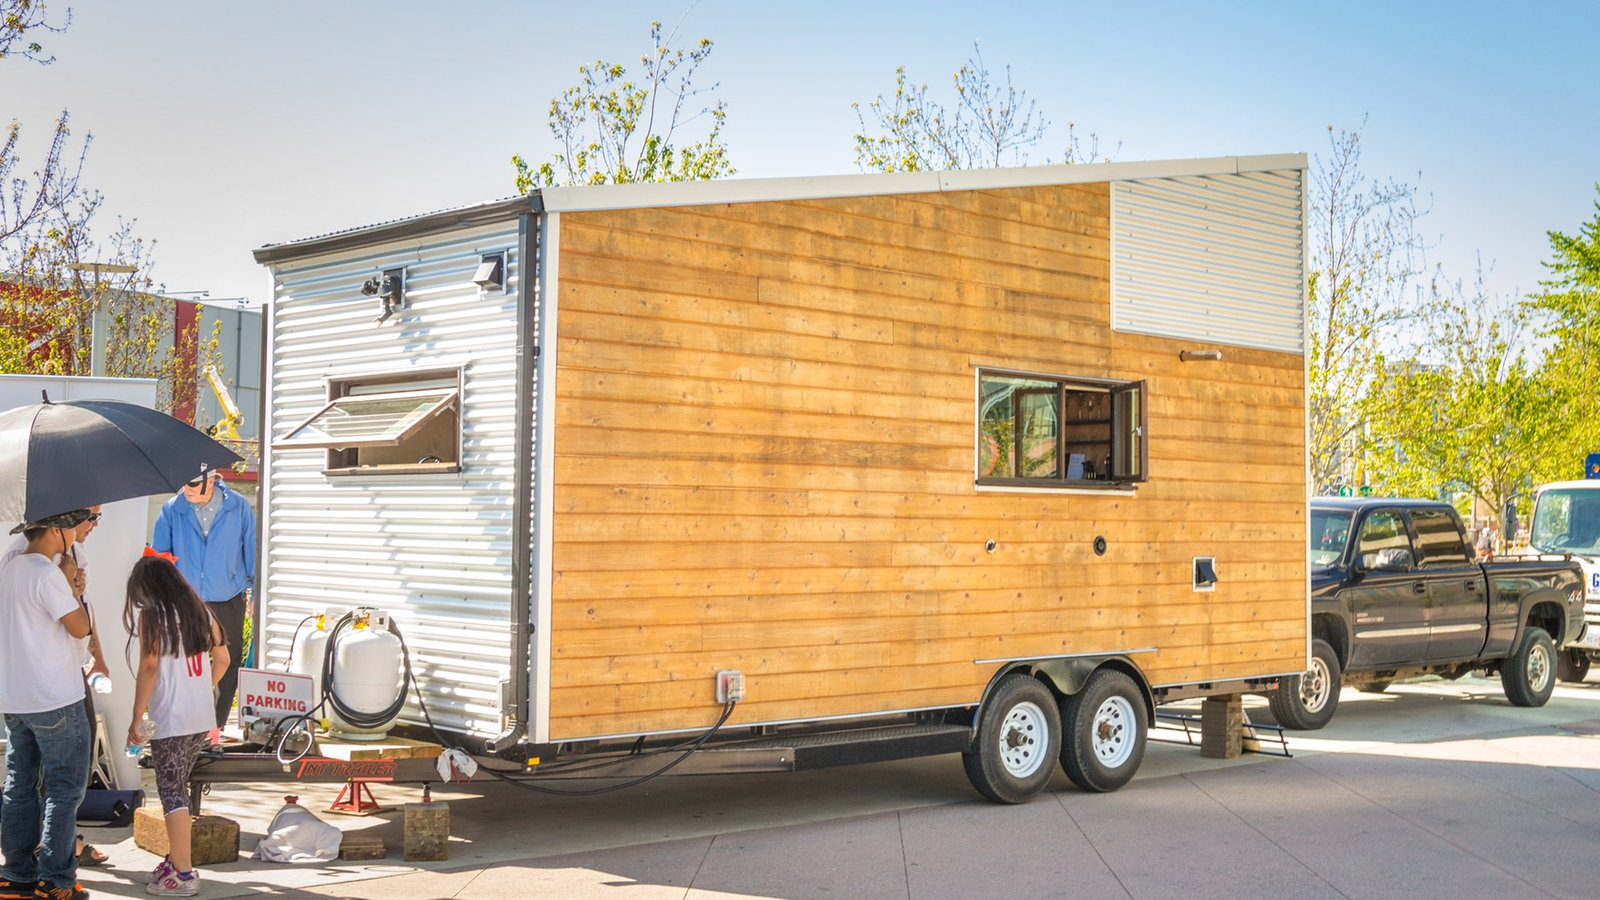 nachhaltigkeit tiny houses leben auf kleinem raum cosmo audio mediathek wdr. Black Bedroom Furniture Sets. Home Design Ideas